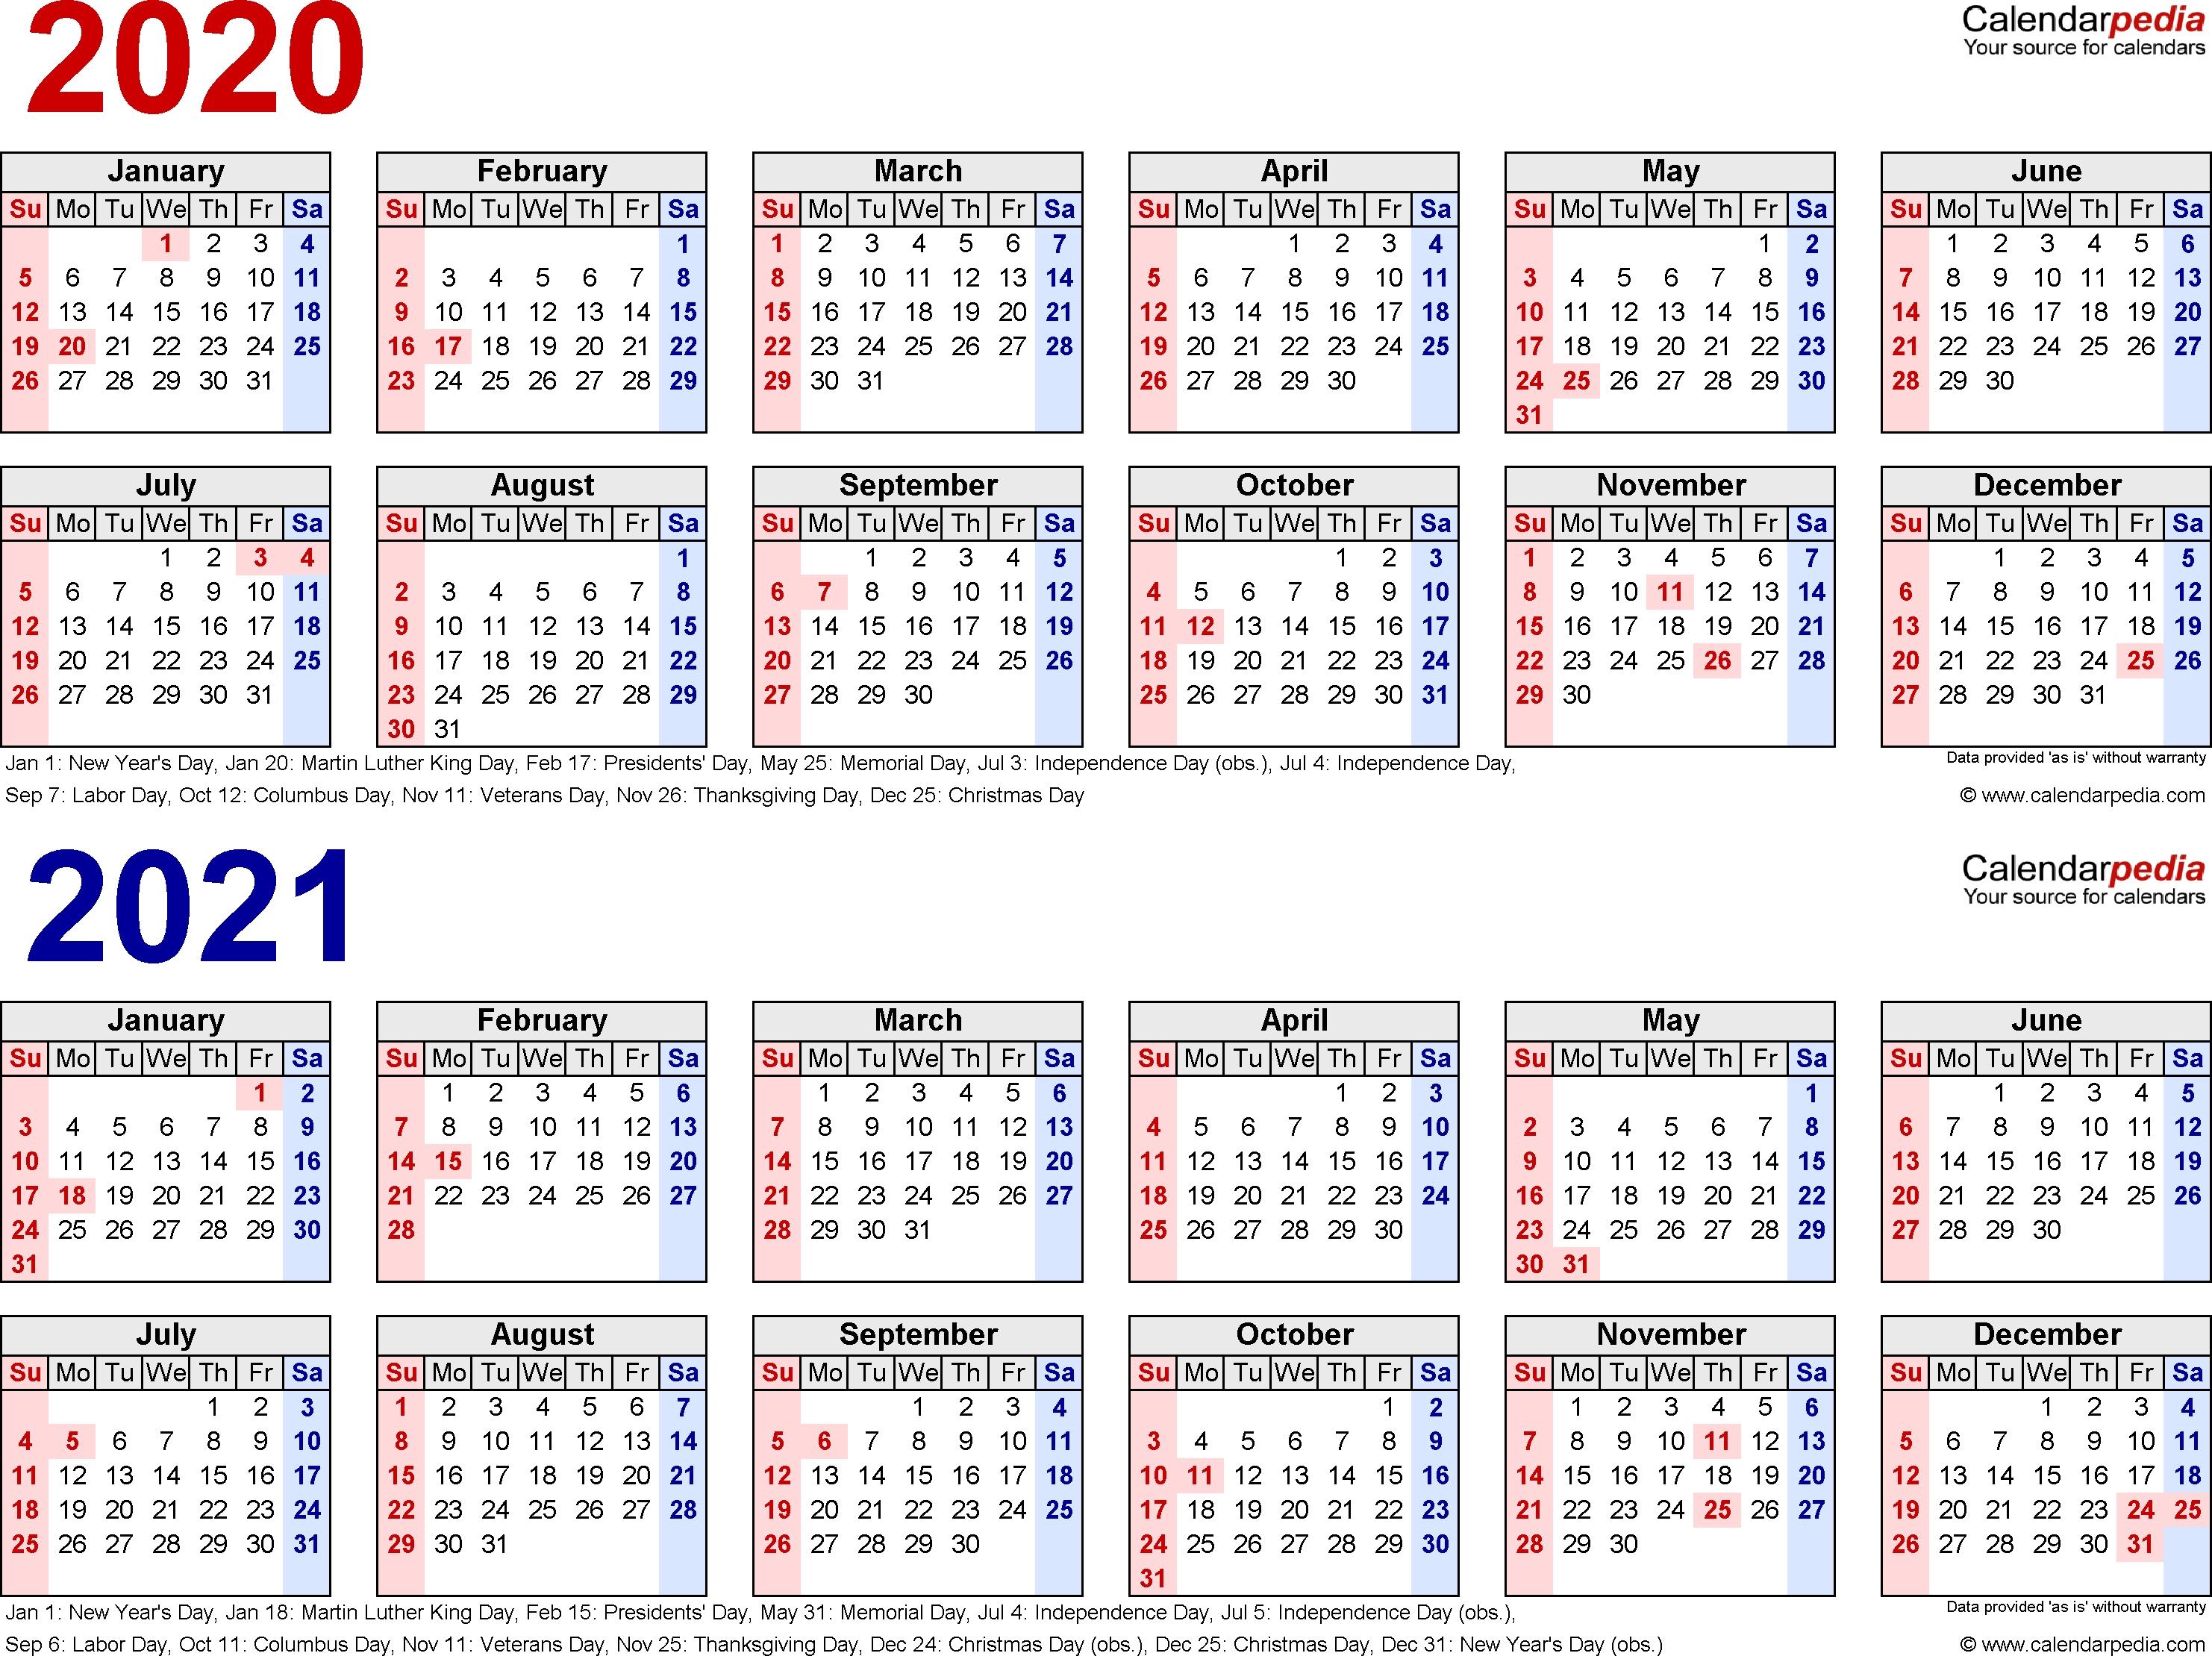 2020-2021 Calendar - Free Printable Two-Year Word Calendars-Calendar Labs 2020 Templates